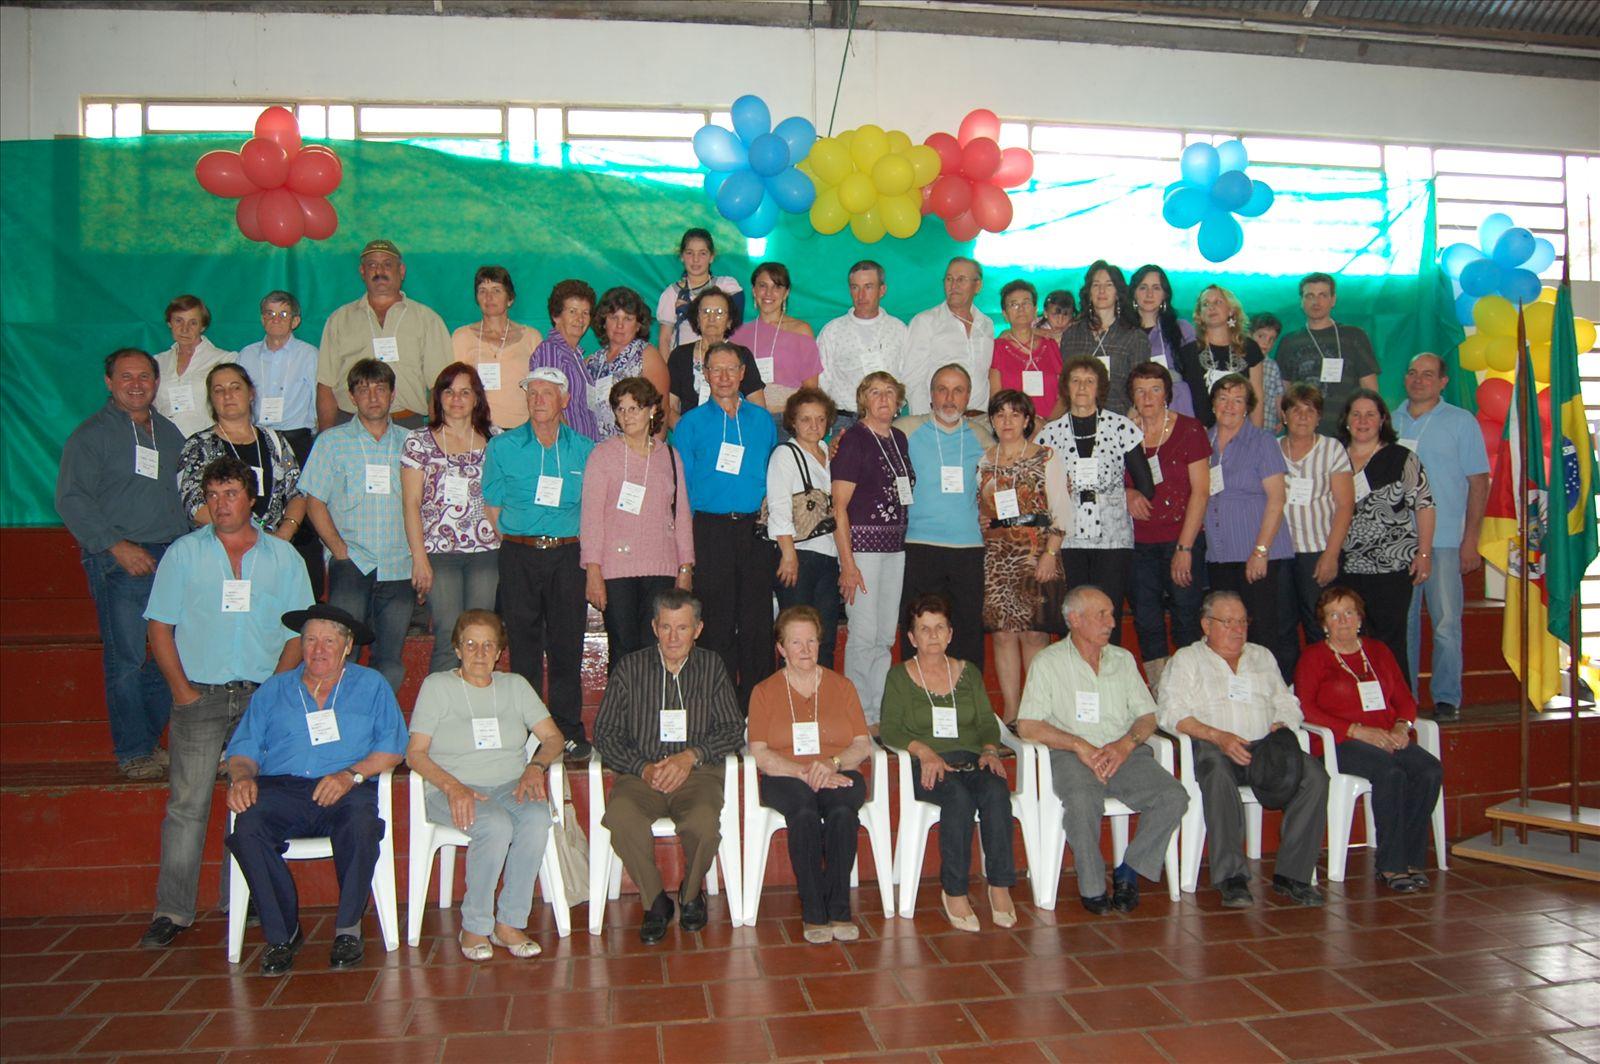 2º Encontro Família Cornelli - 11.10.2009 (182)_0